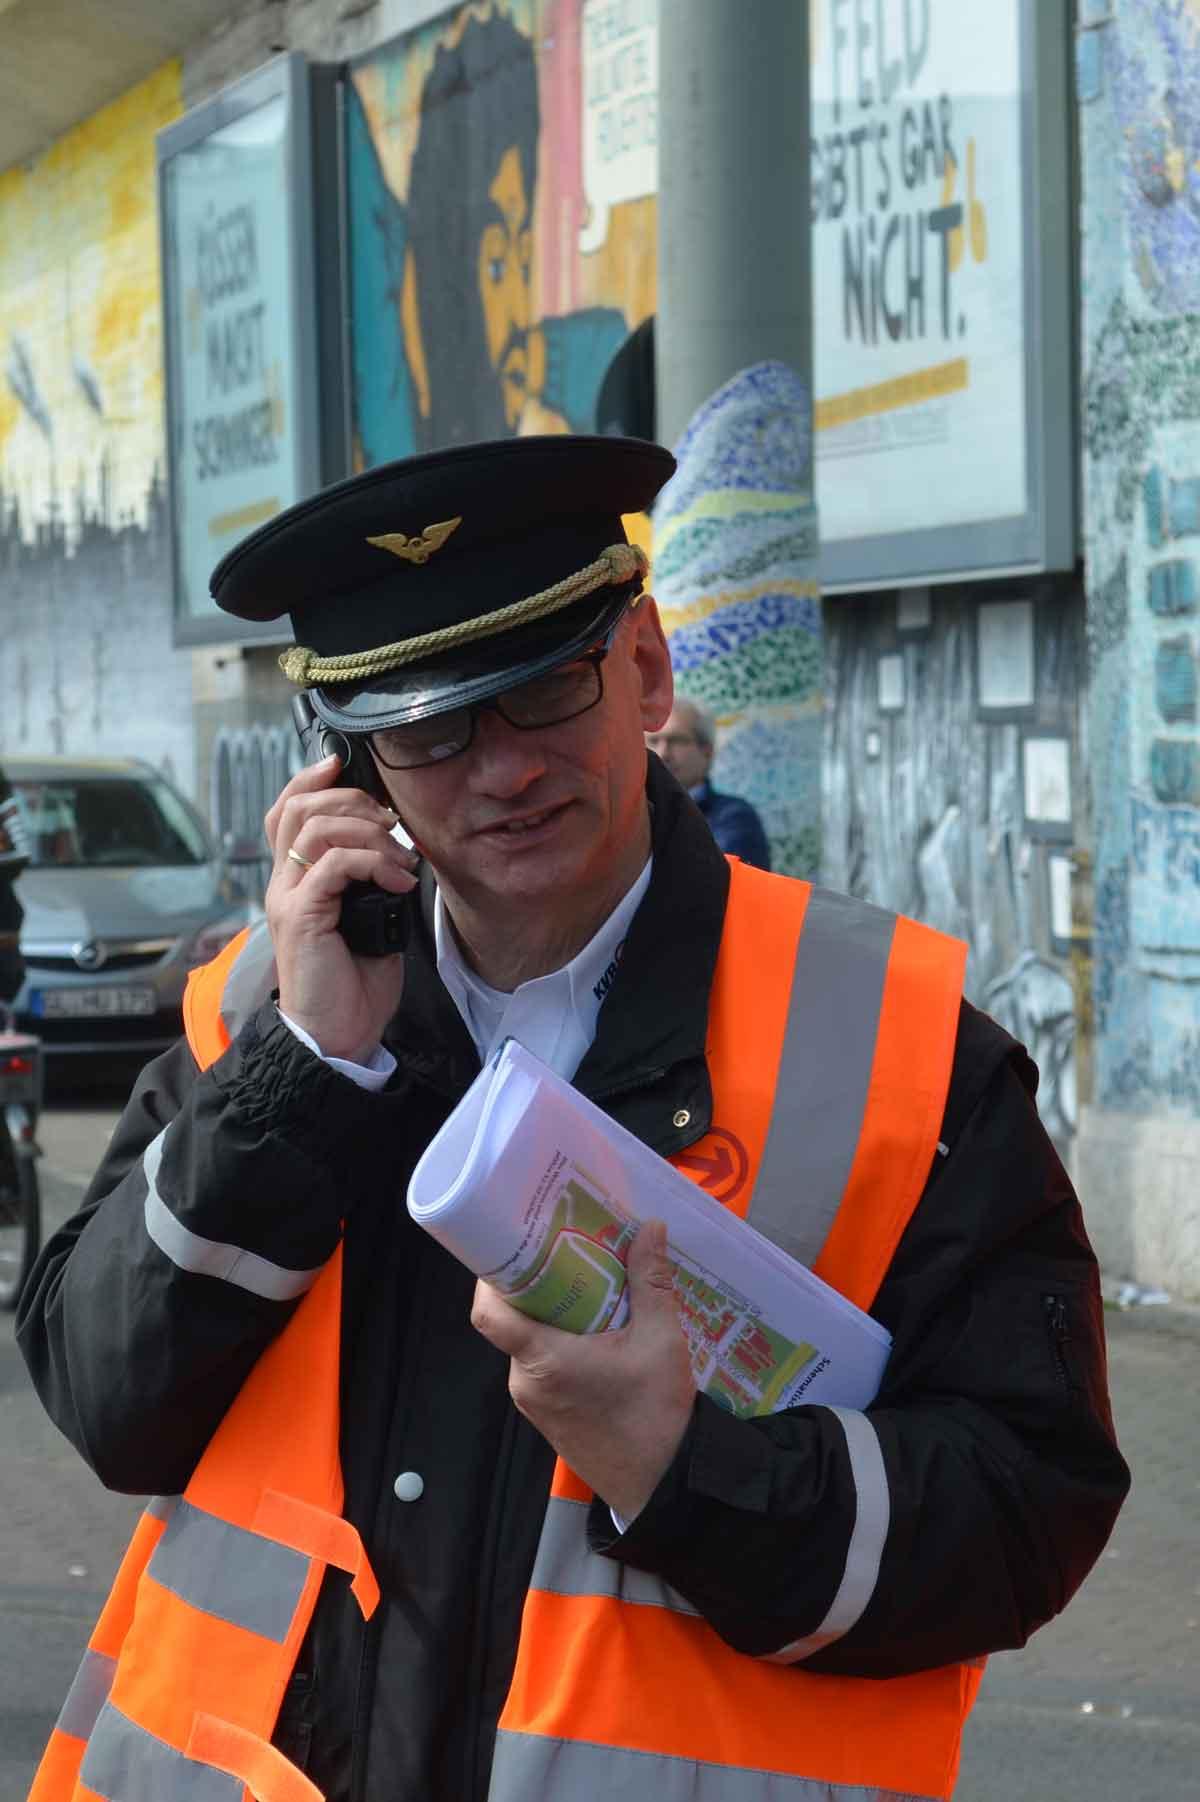 Oberverkehrsmeister Peter hat die Einsatzleitung am Bahnhof Ehrenfeld.